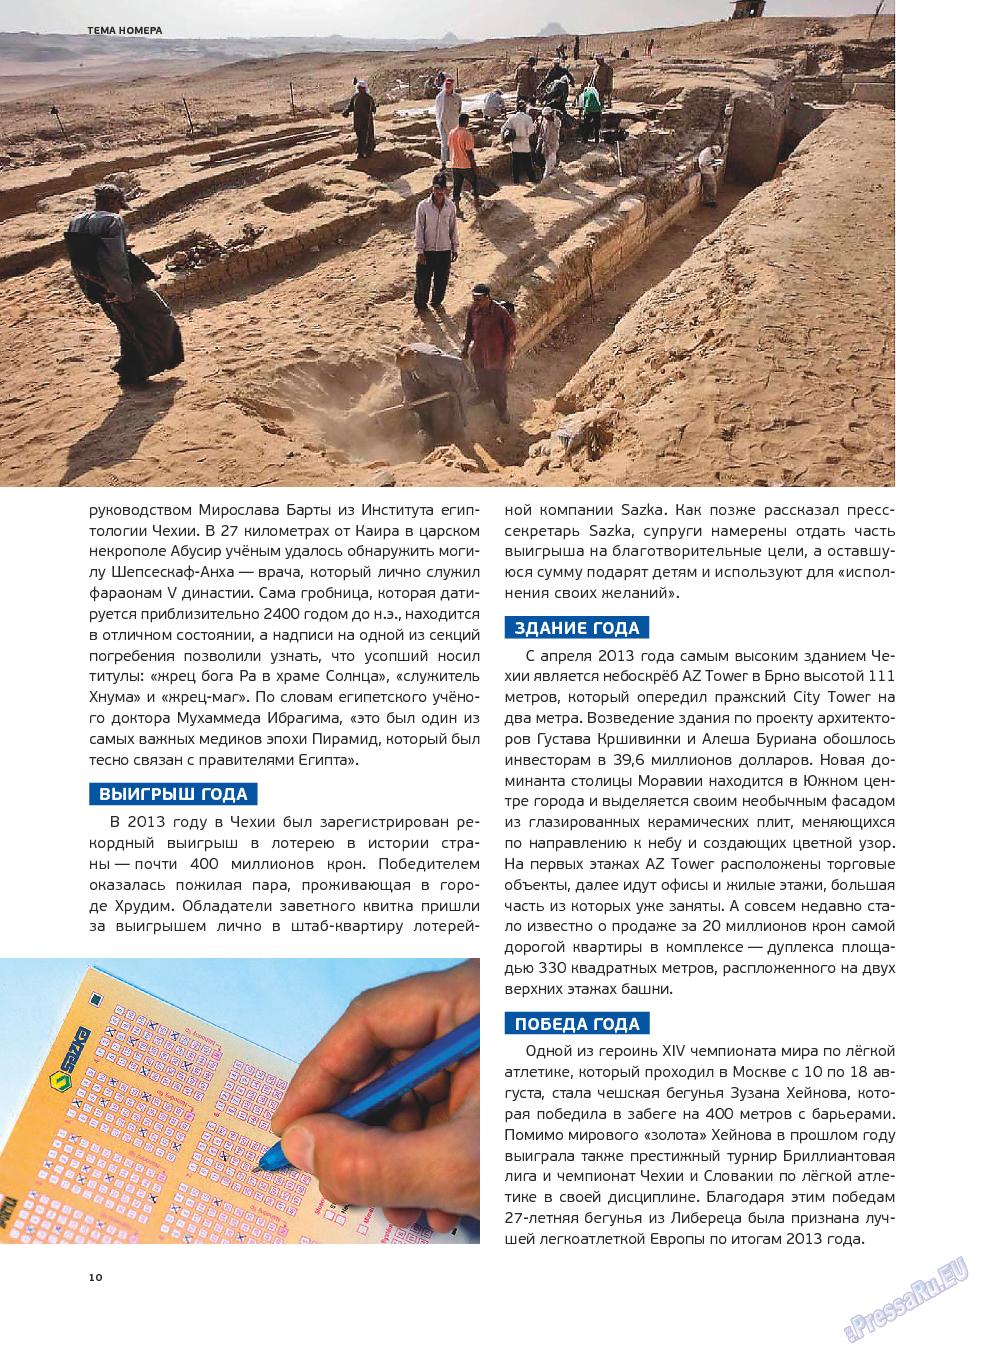 Артек (журнал). 2013 год, номер 6, стр. 12